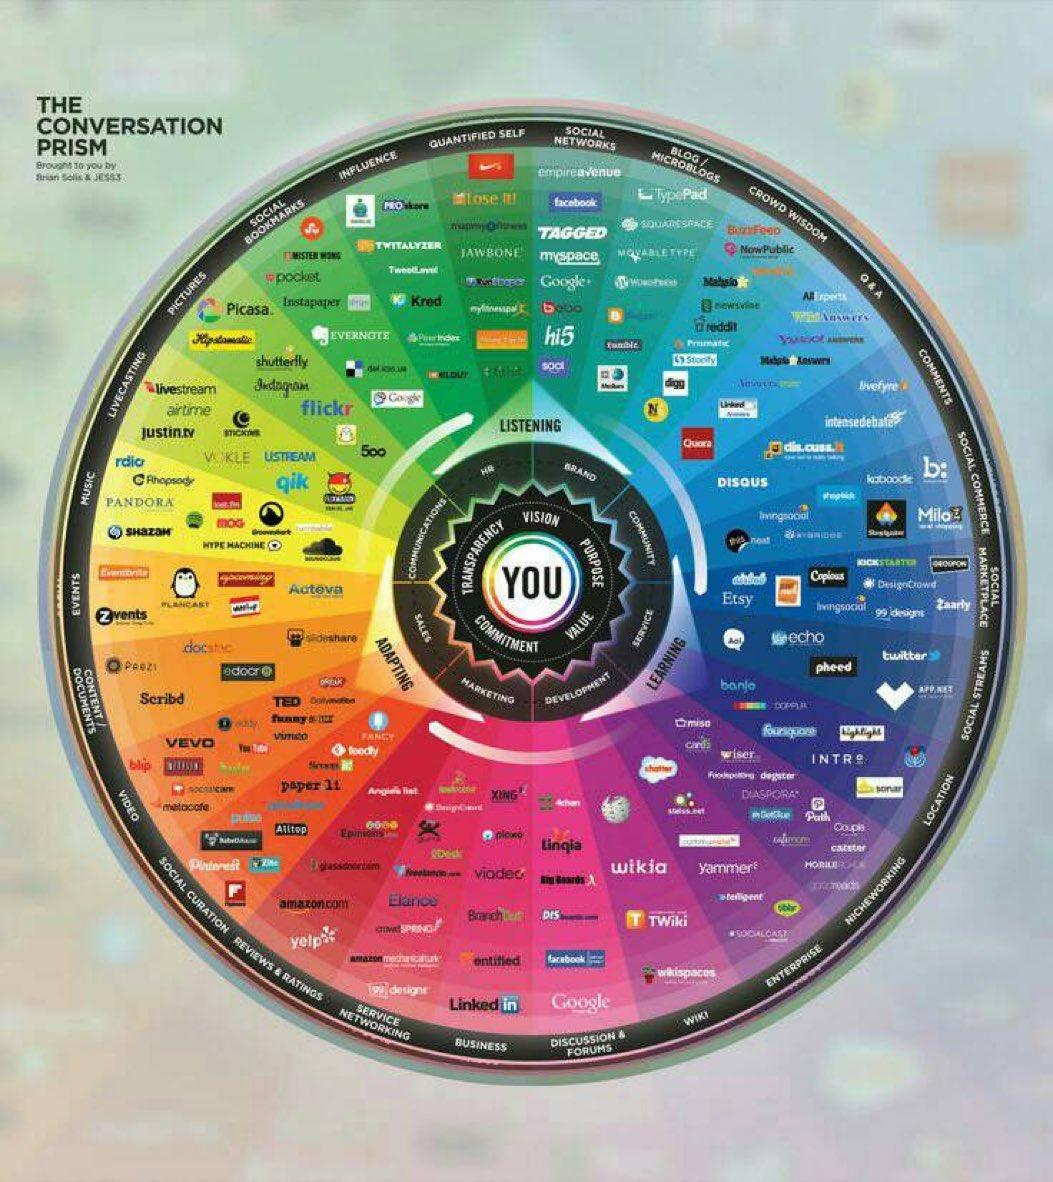 #SocialMedia Landscape #SMM #Marketing #retail #Growthhacking #CMO #IoT #Tech #Contentmarketing #Dataviz #FMCG #SEO #AI #BigData #Business<br>http://pic.twitter.com/PSBAYLdSrW